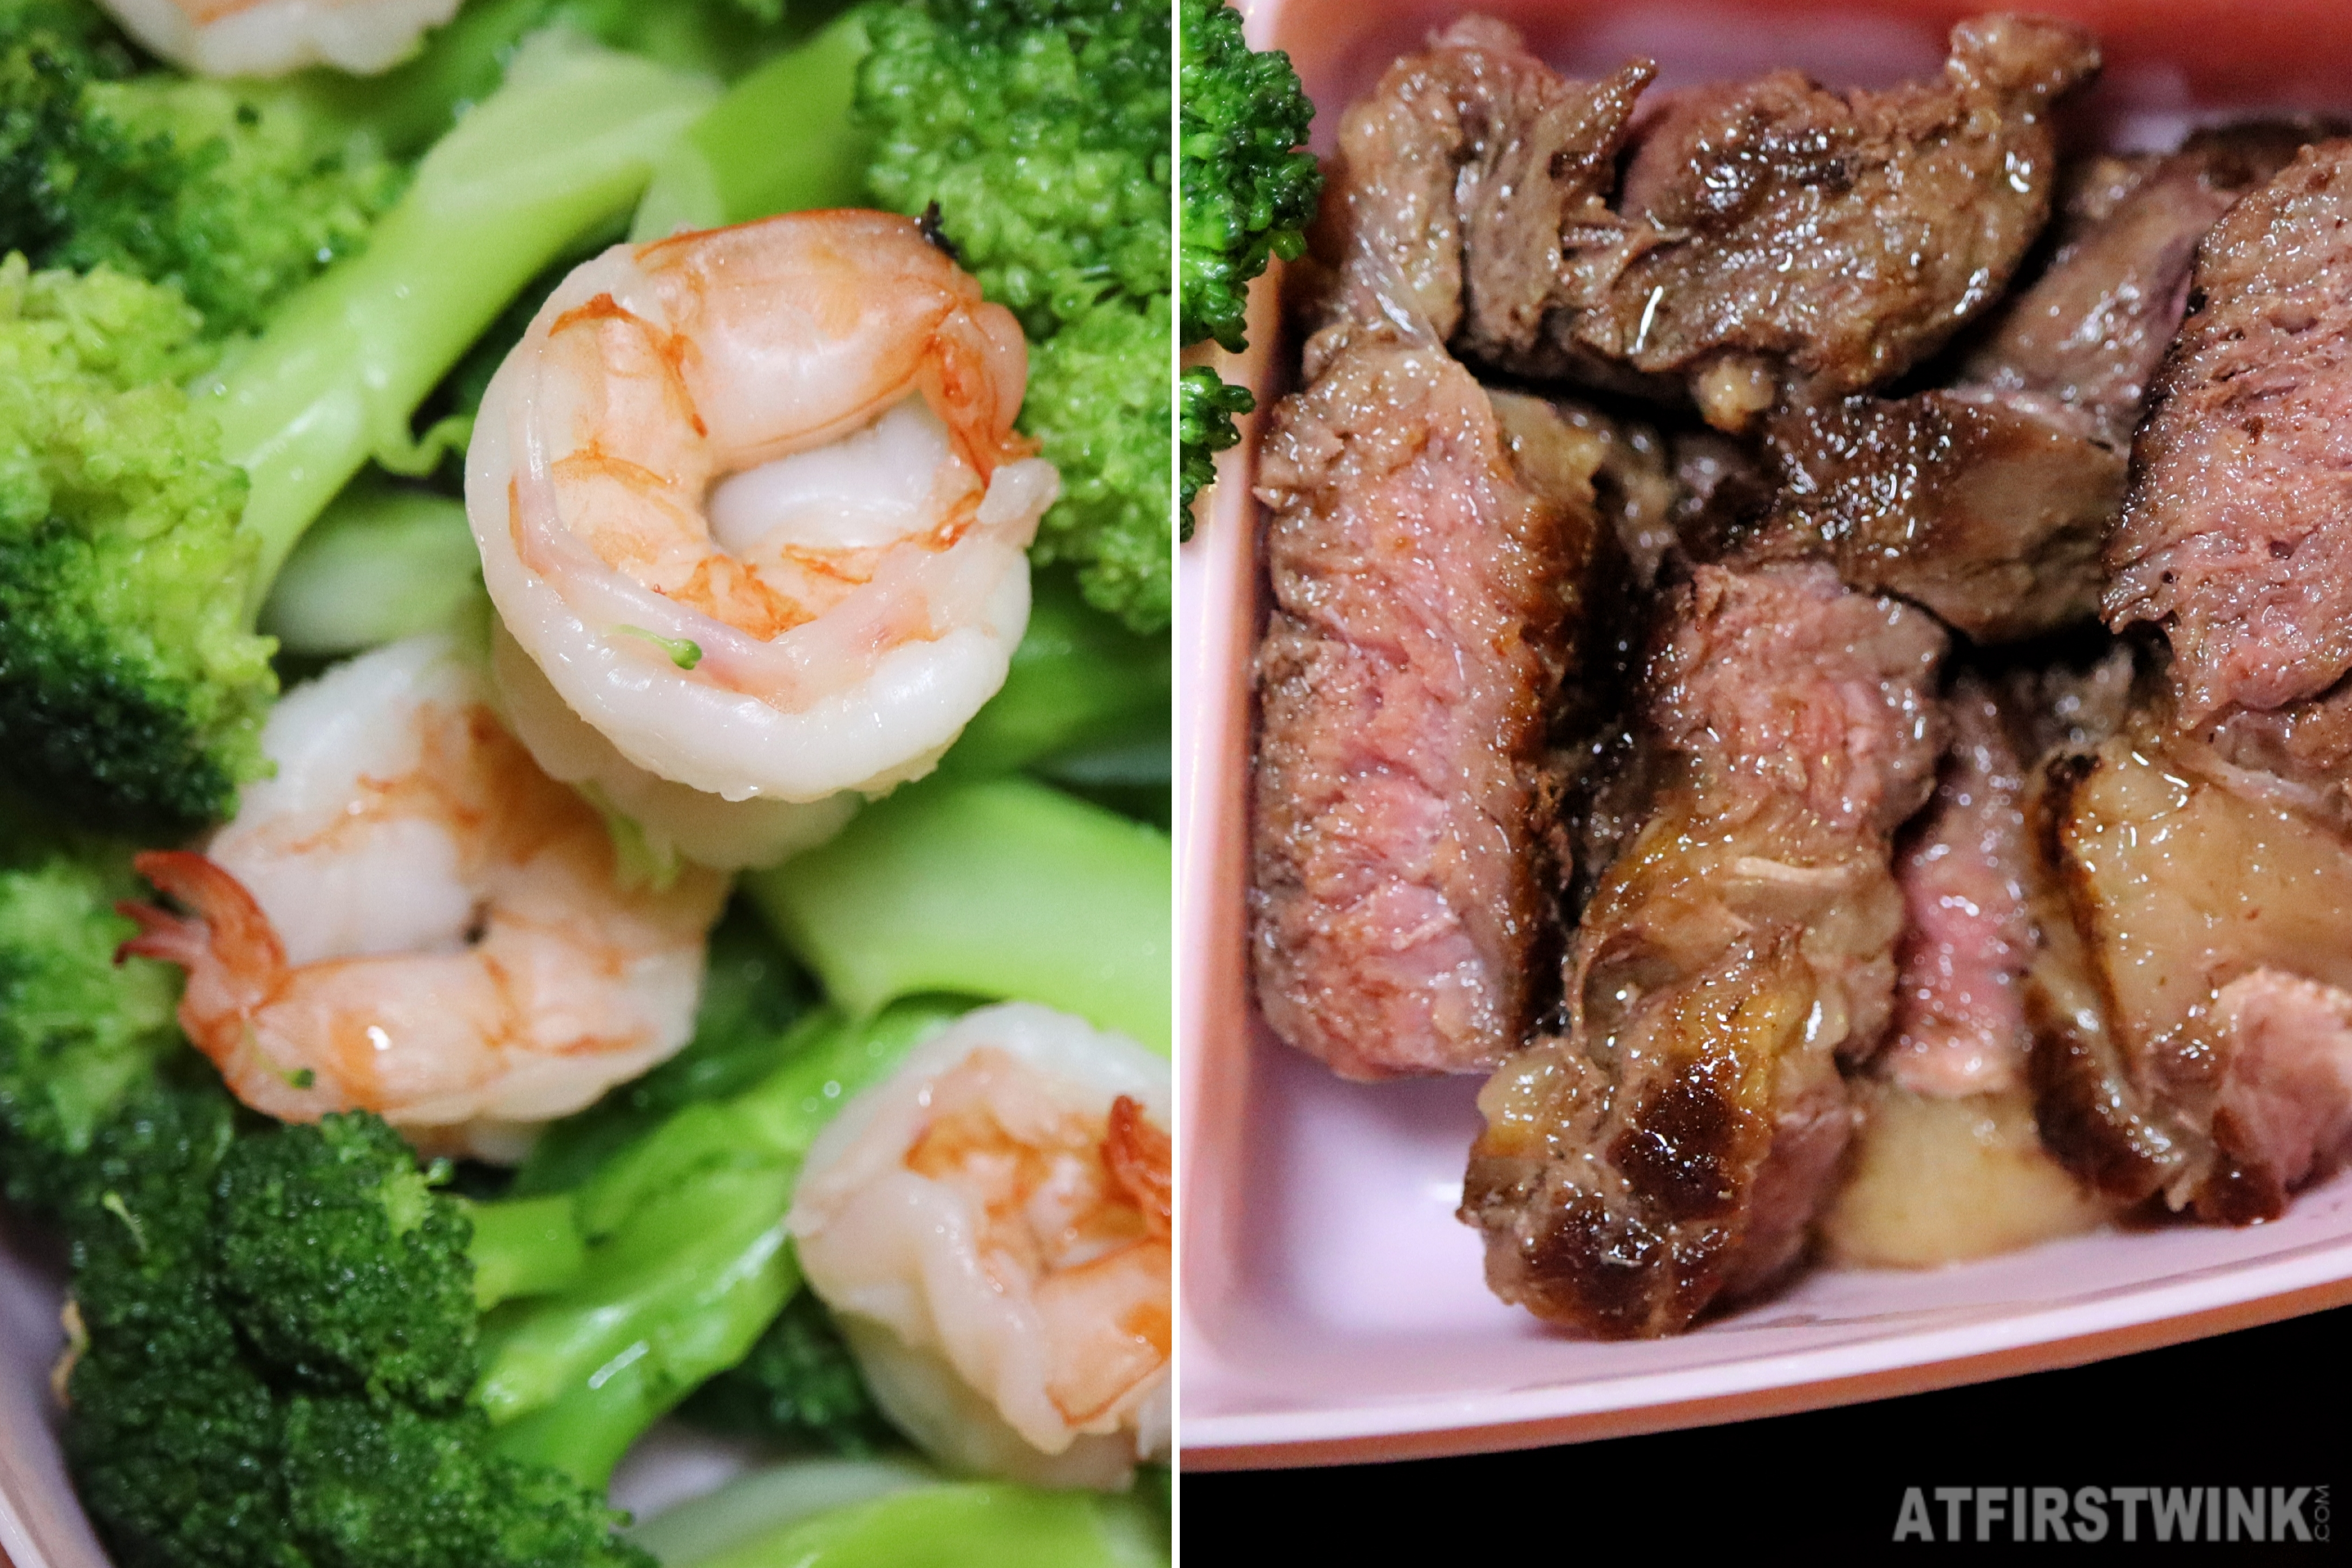 Zoomed in stirfried broccoli shrimp panfried steak